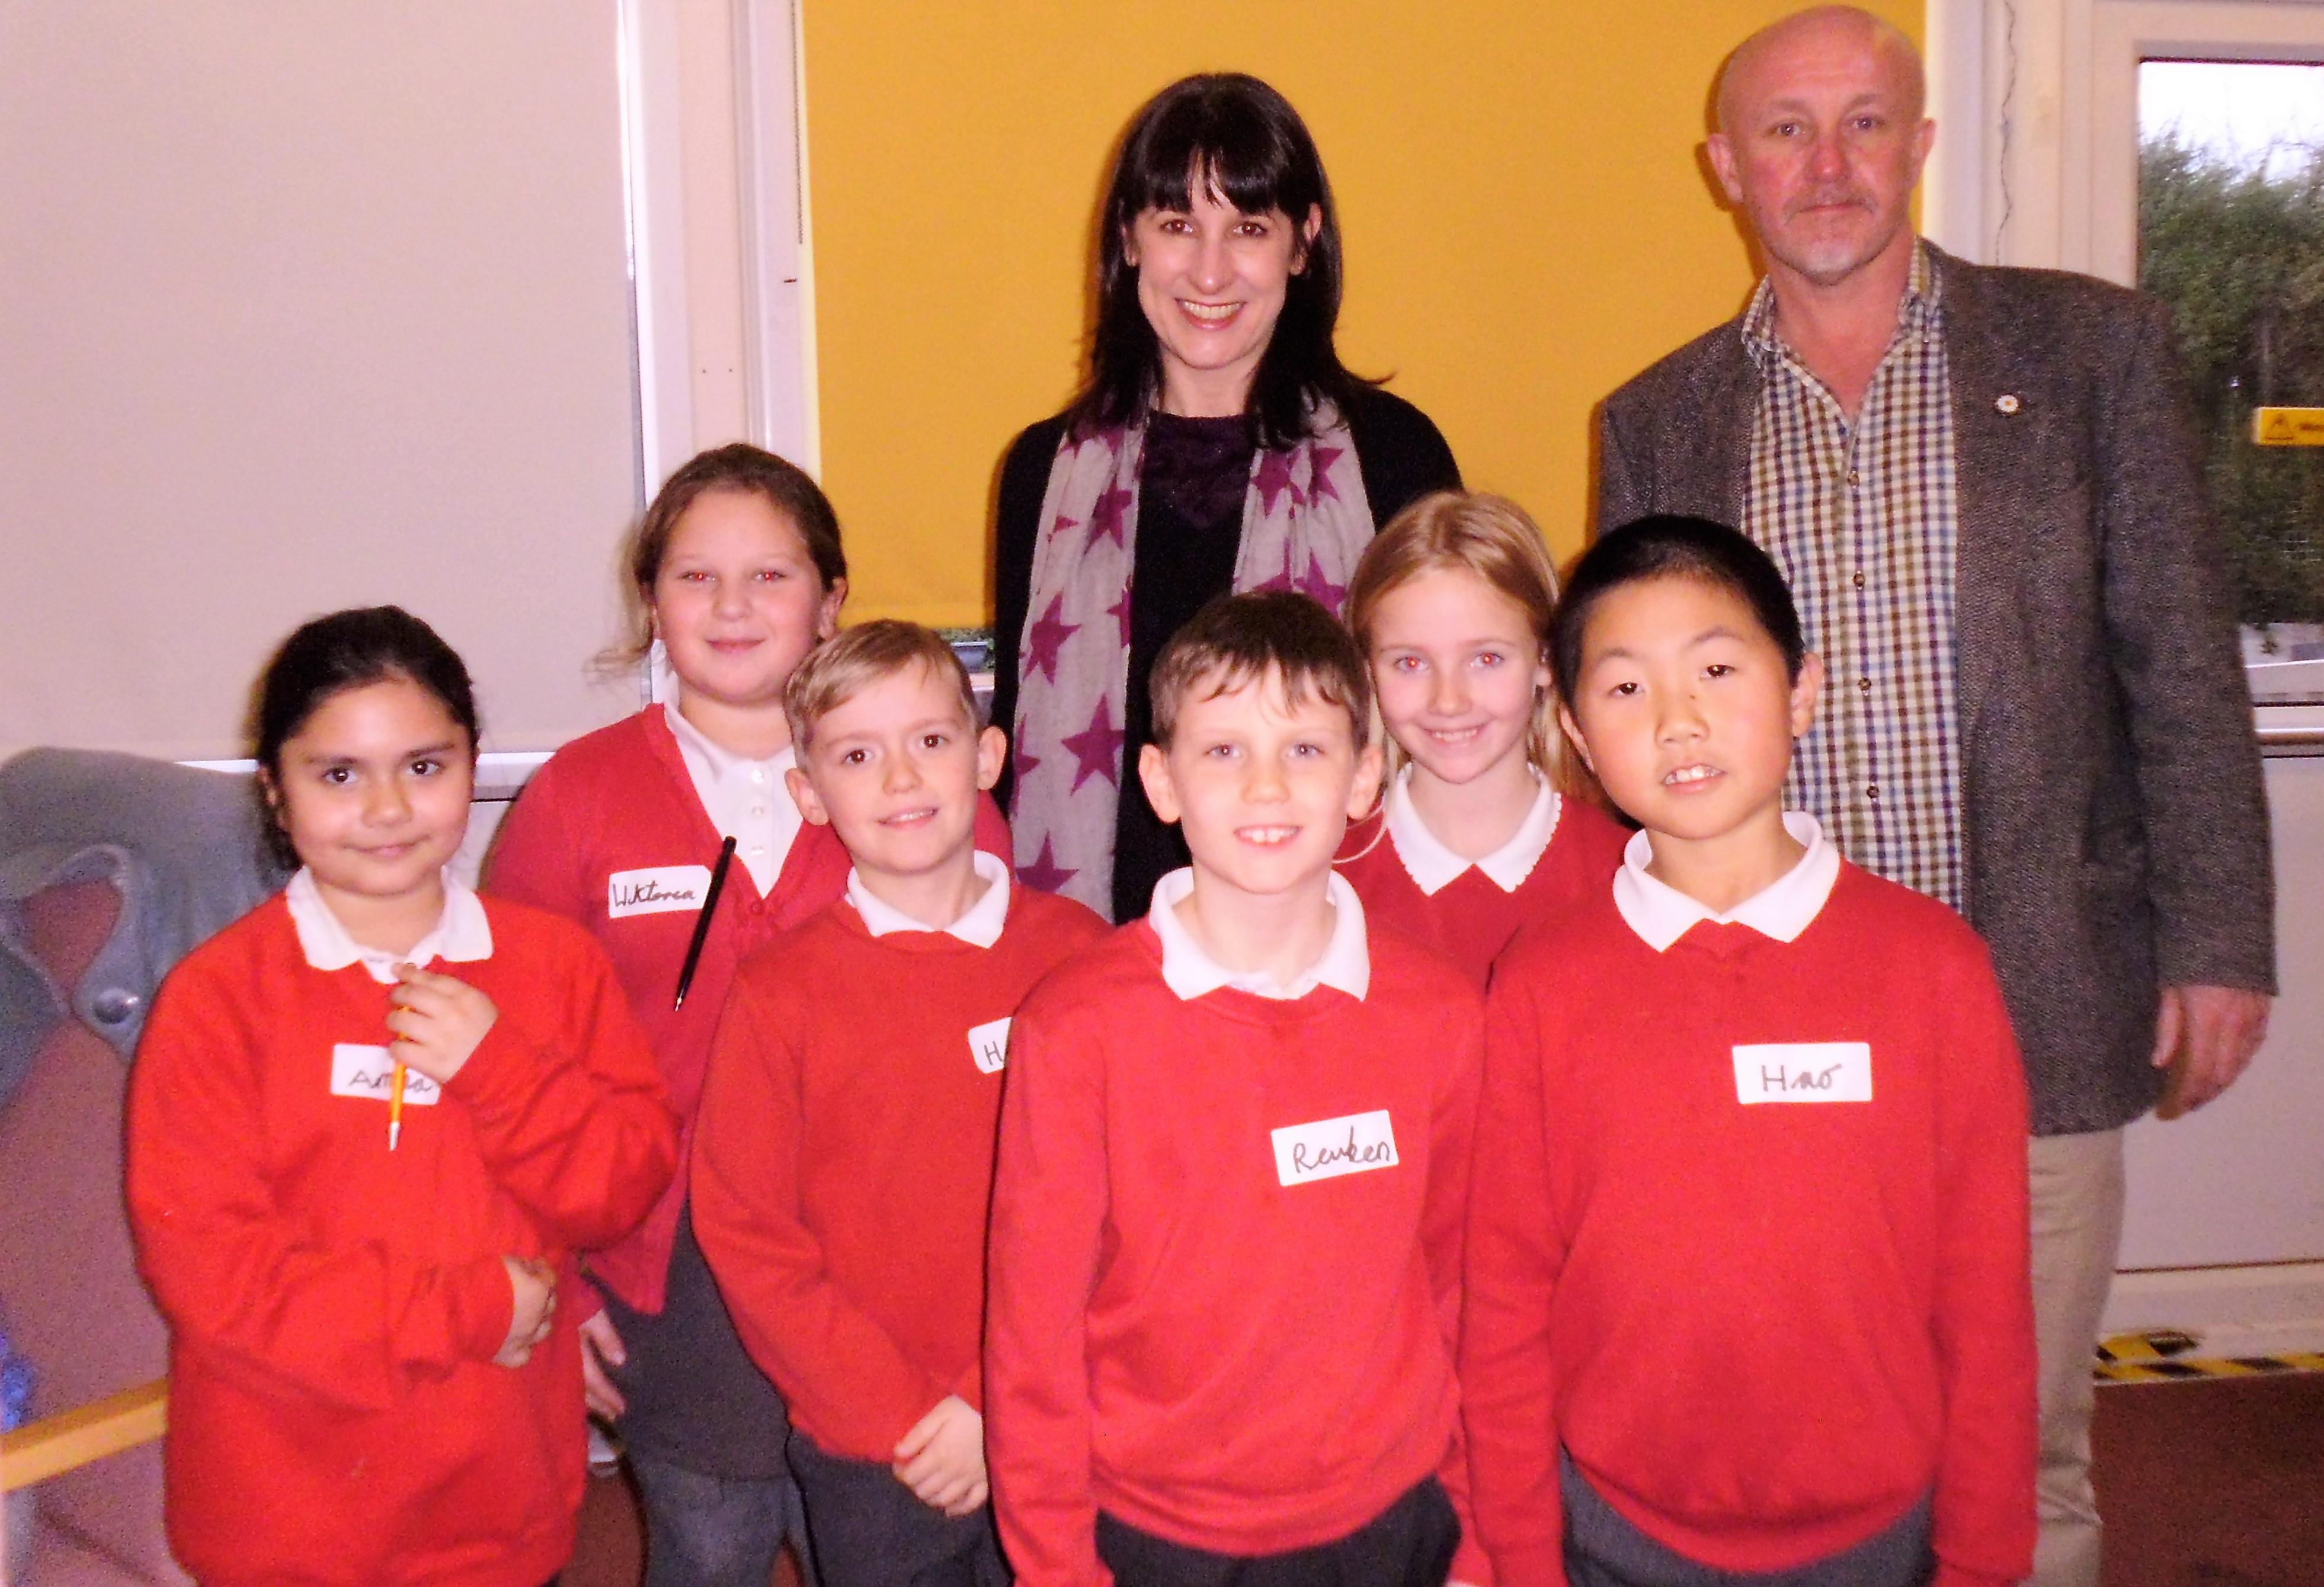 School Story – Raynville Primary School, Leeds